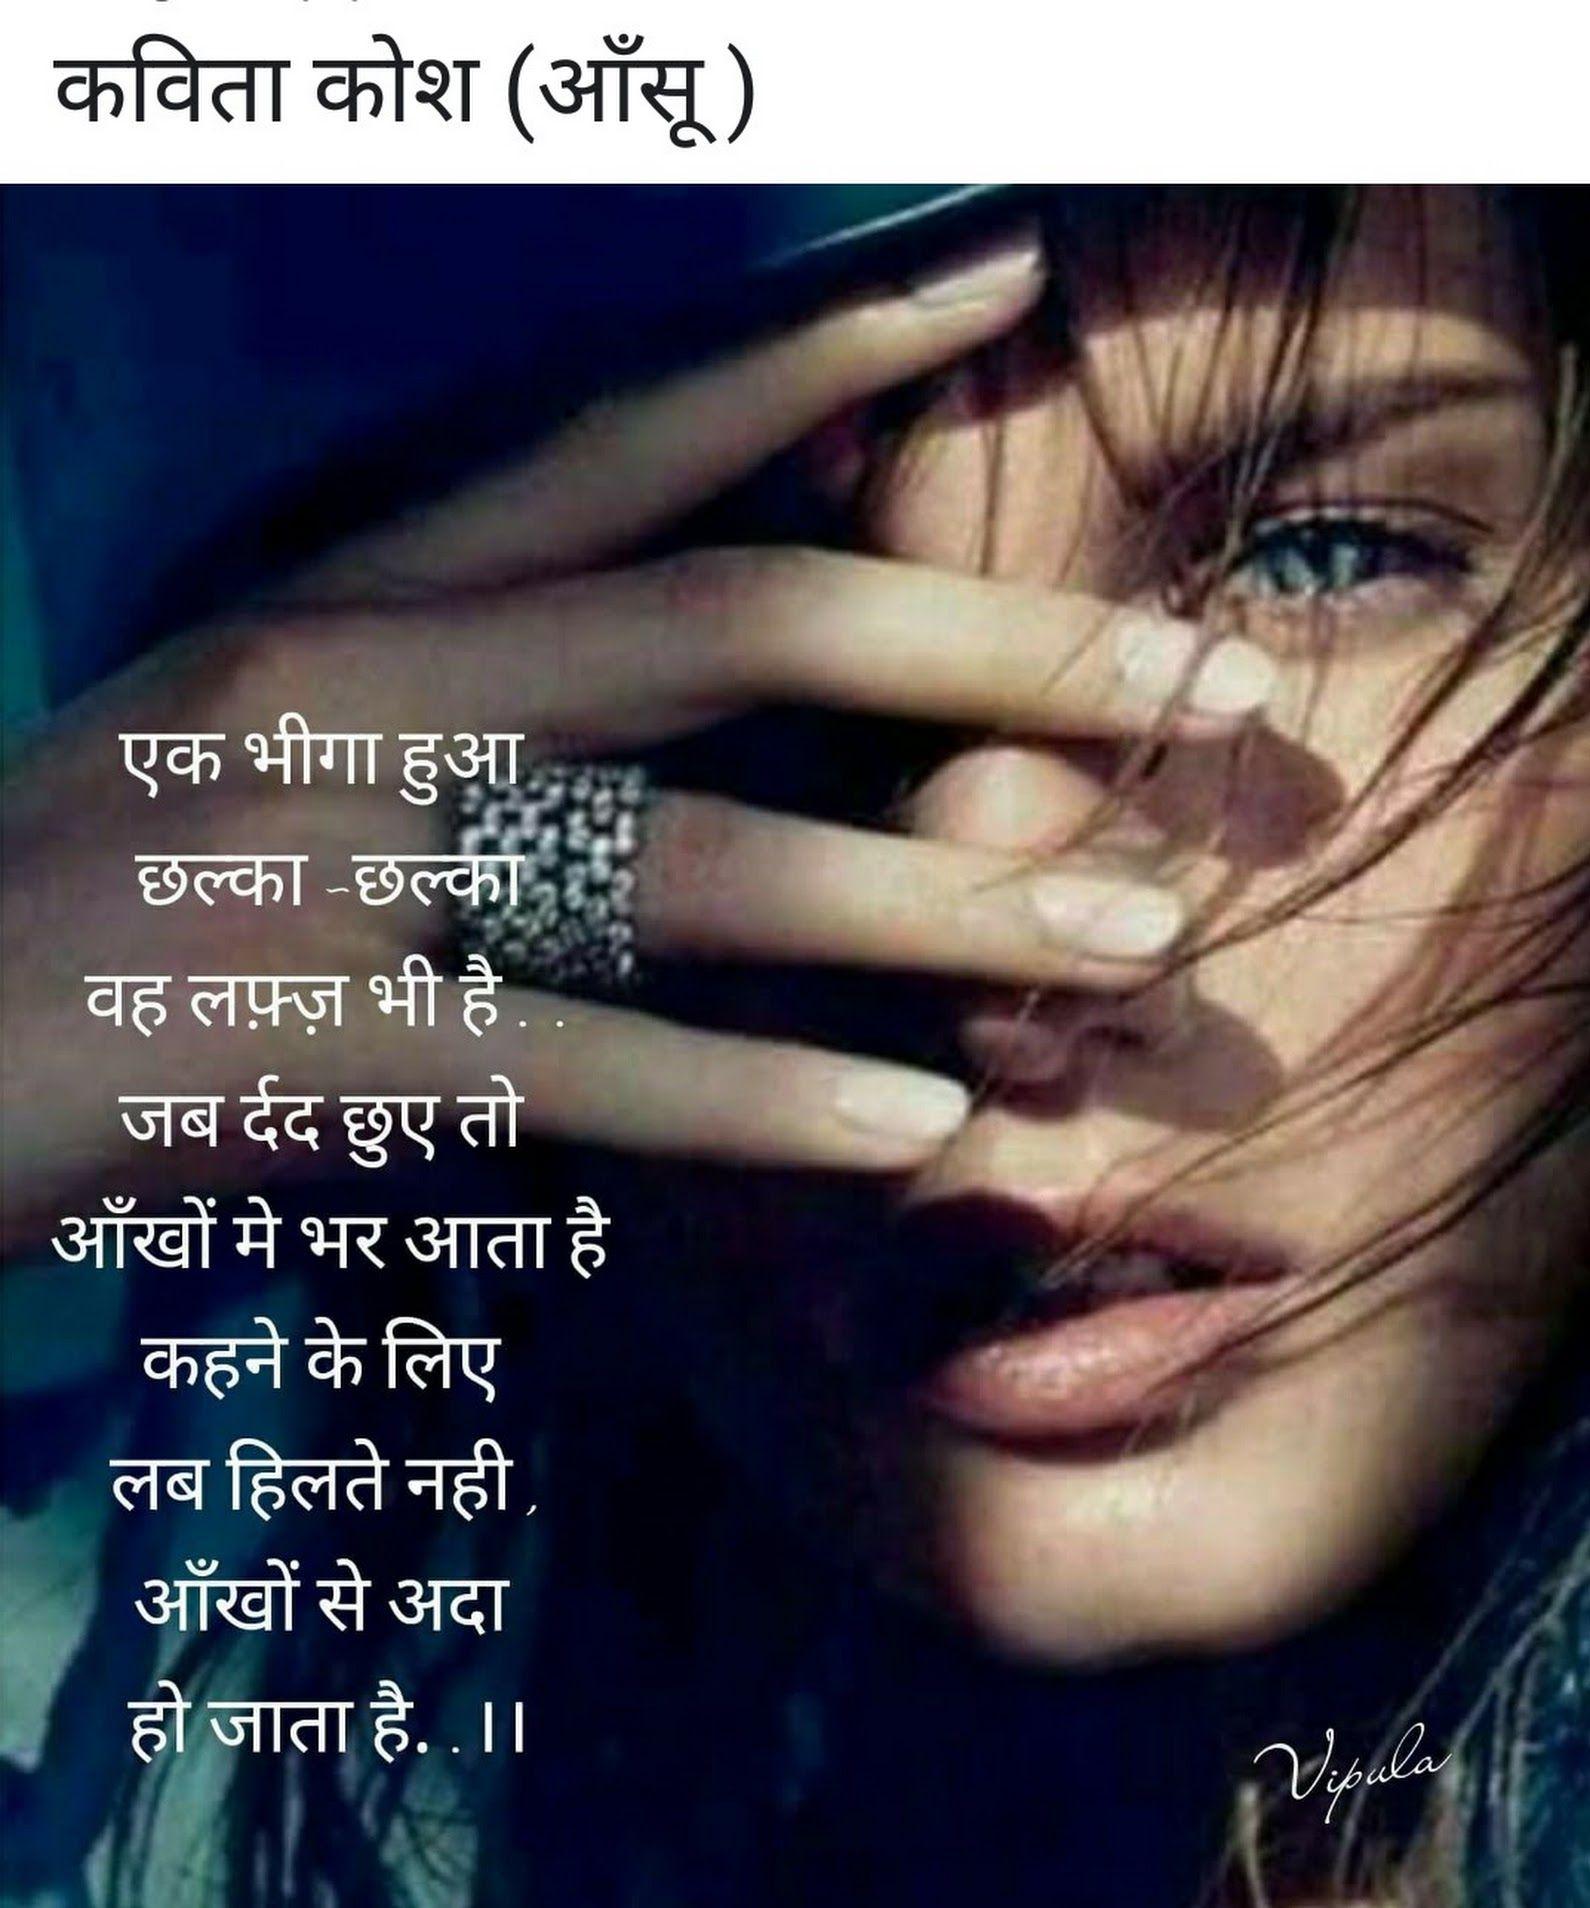 अस्मिता कुलकर्णी - Google+ | Hindi quotes, Feelings, Okay ...